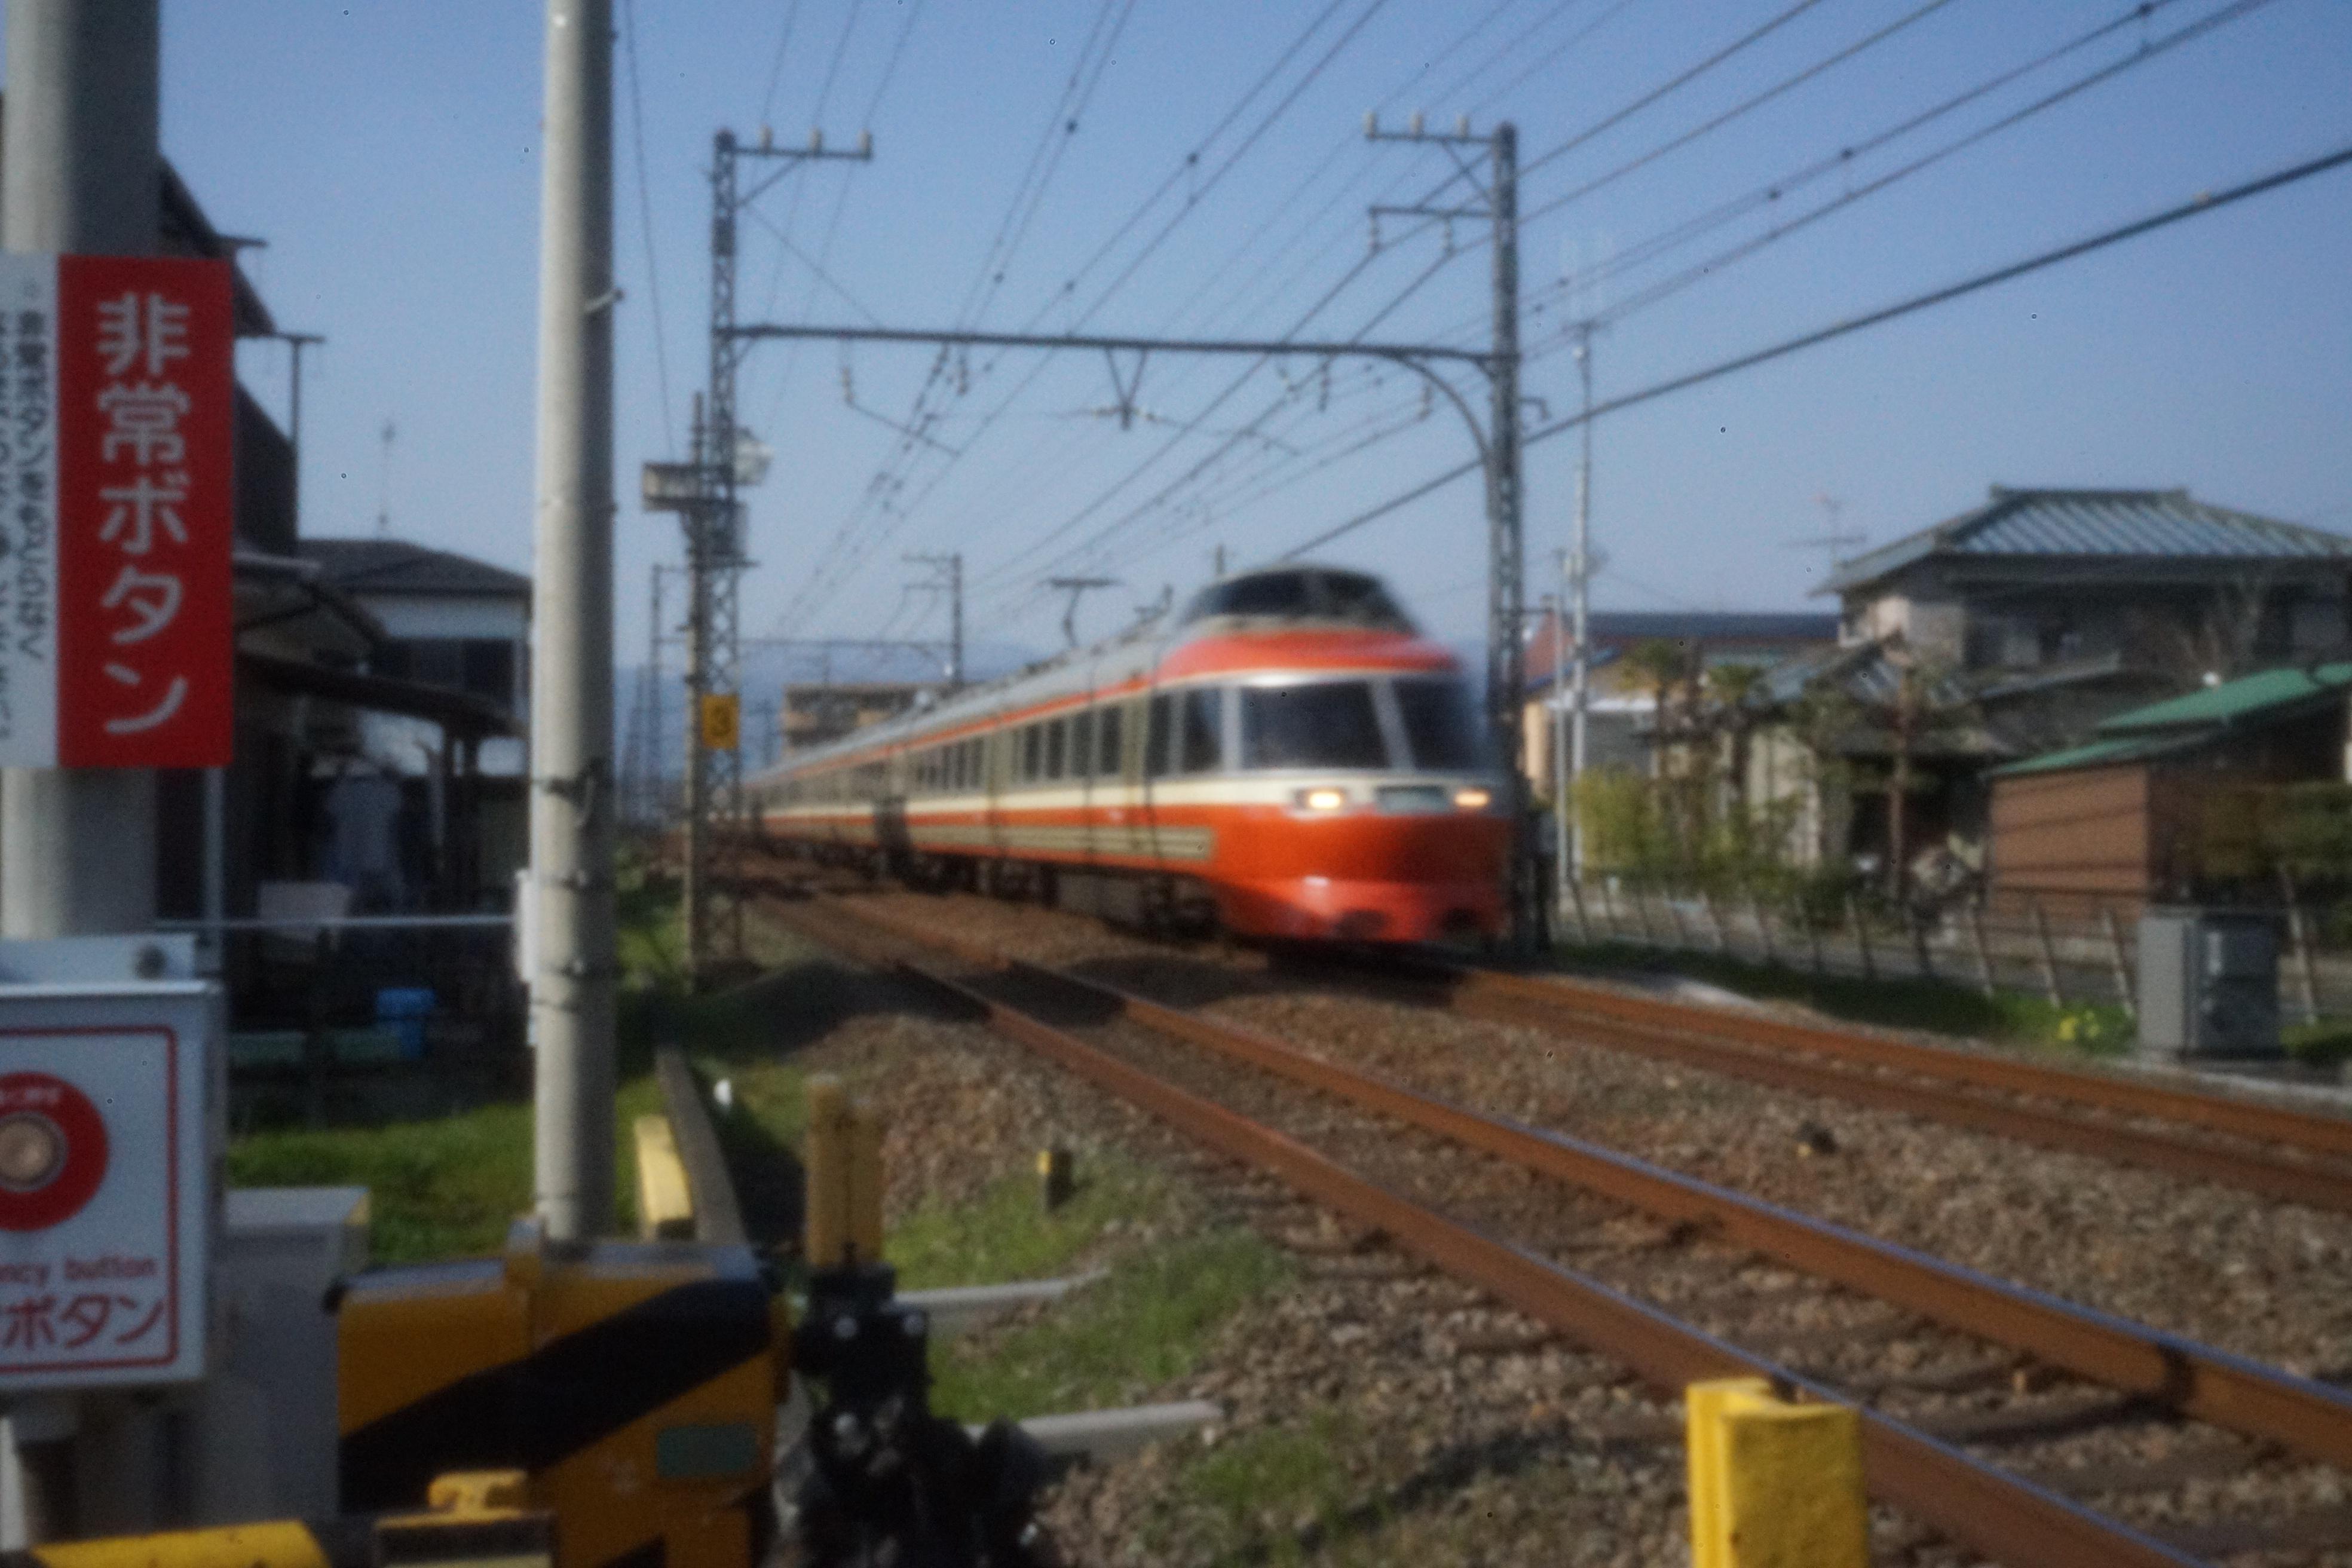 LSE0031406.jpg